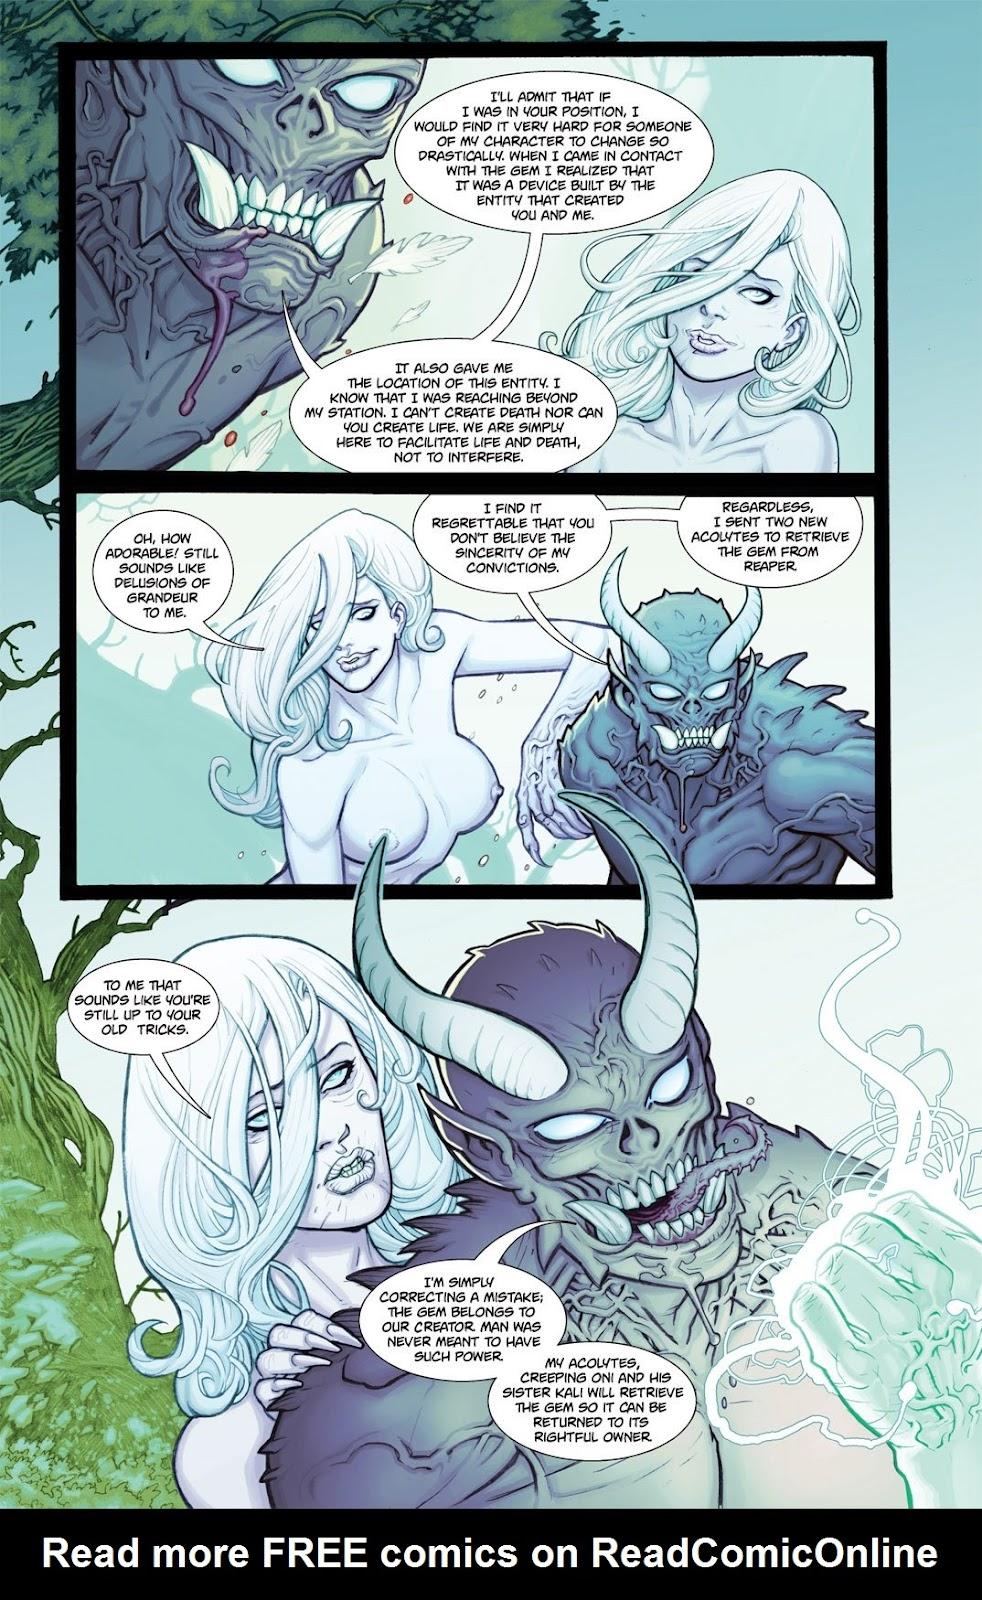 Read online Reaper comic -  Issue #2 - 5